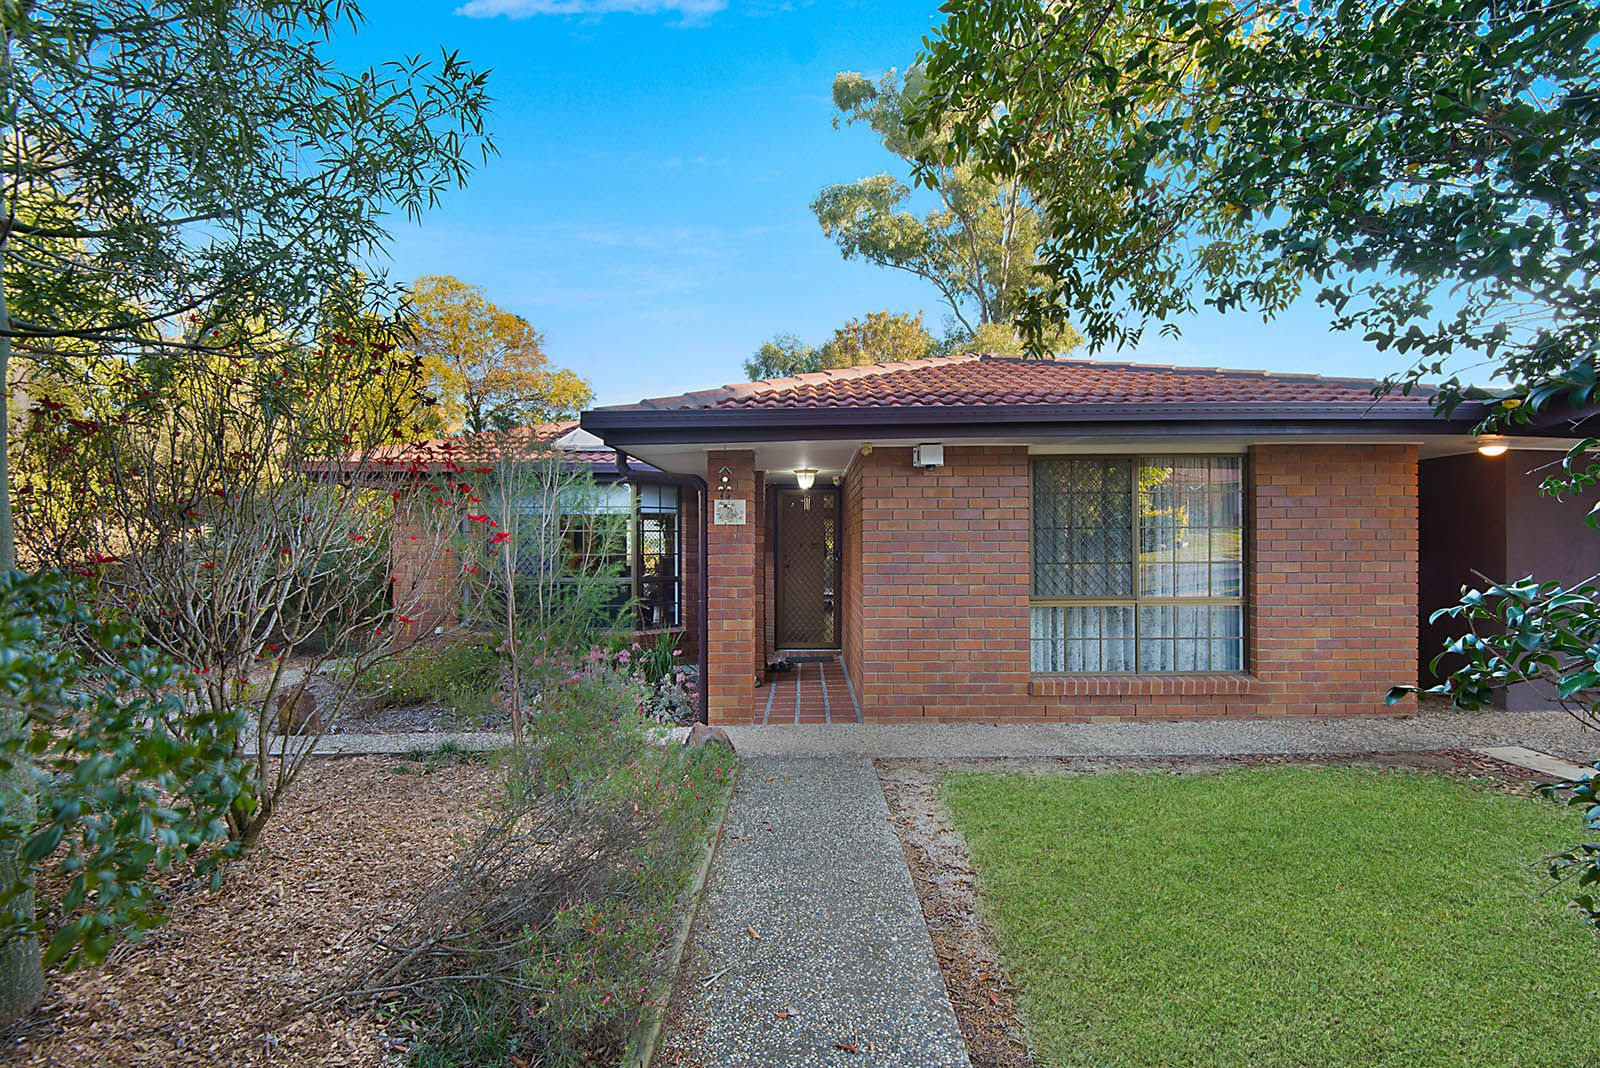 8 Dunleath Street, Durack QLD 4077, Image 0